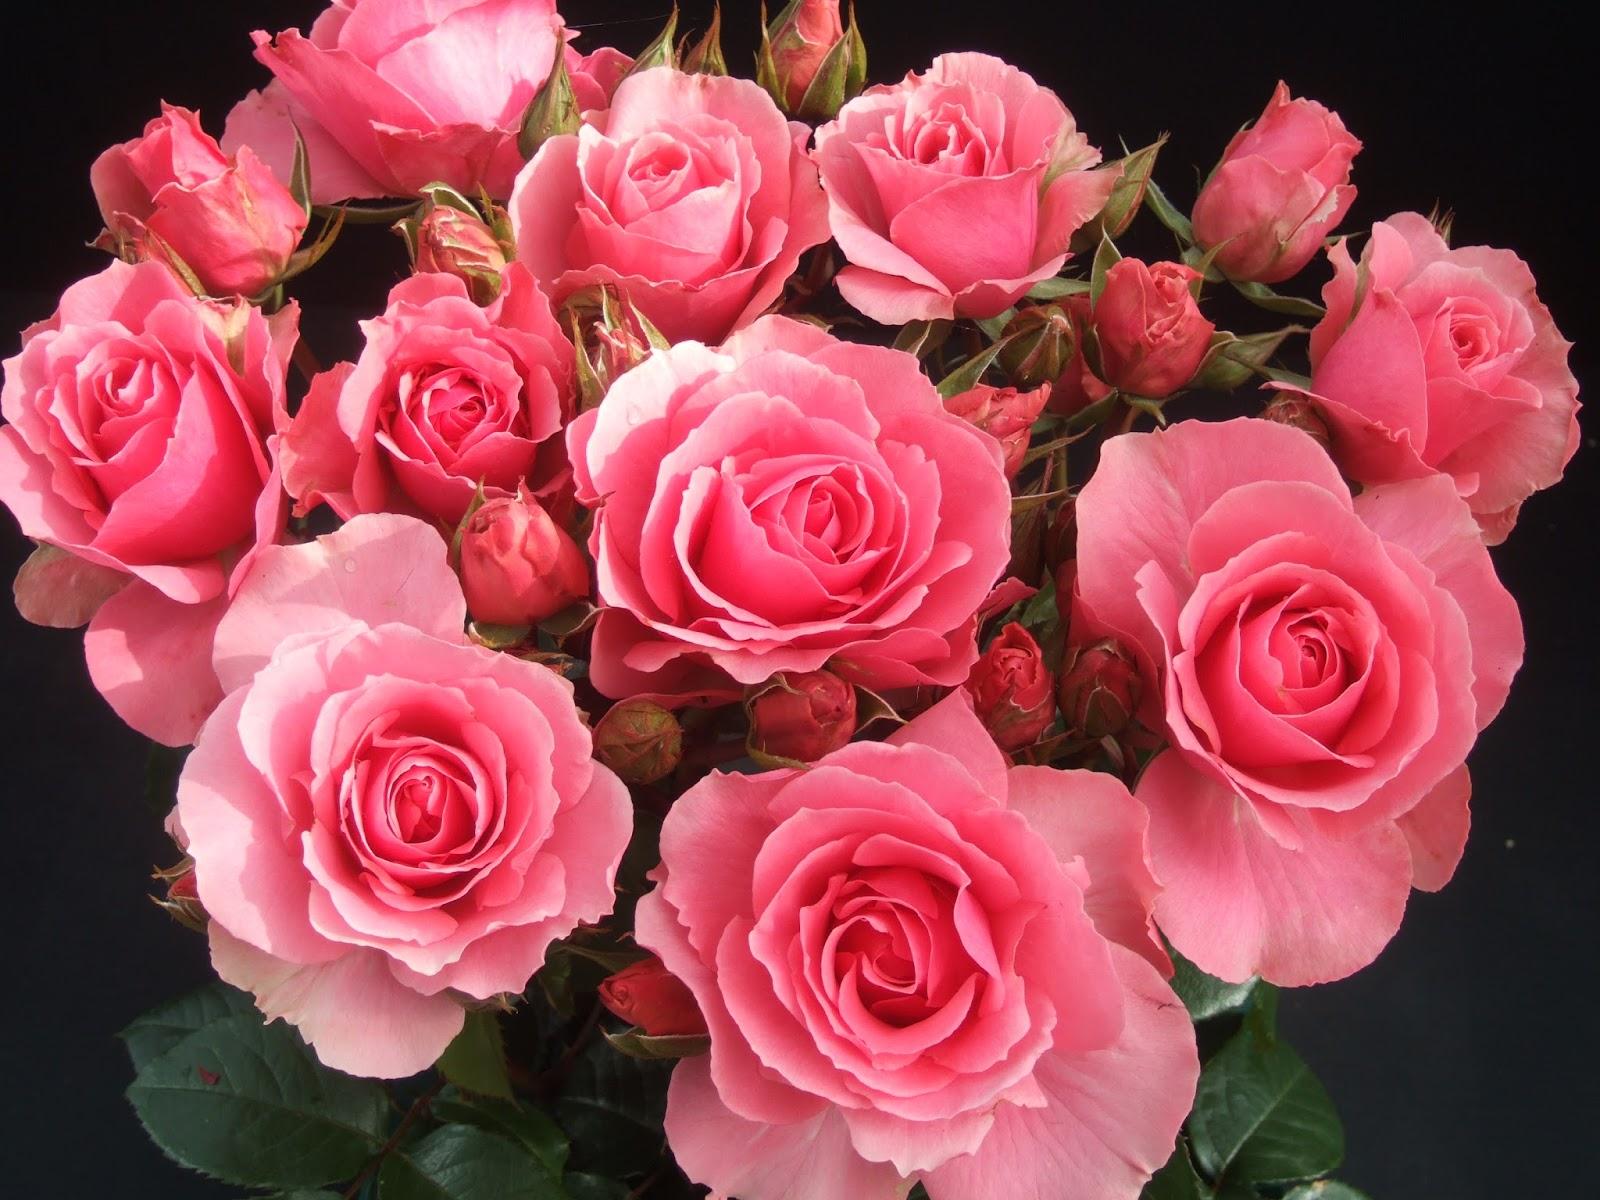 Thousands of Rose Cultivars